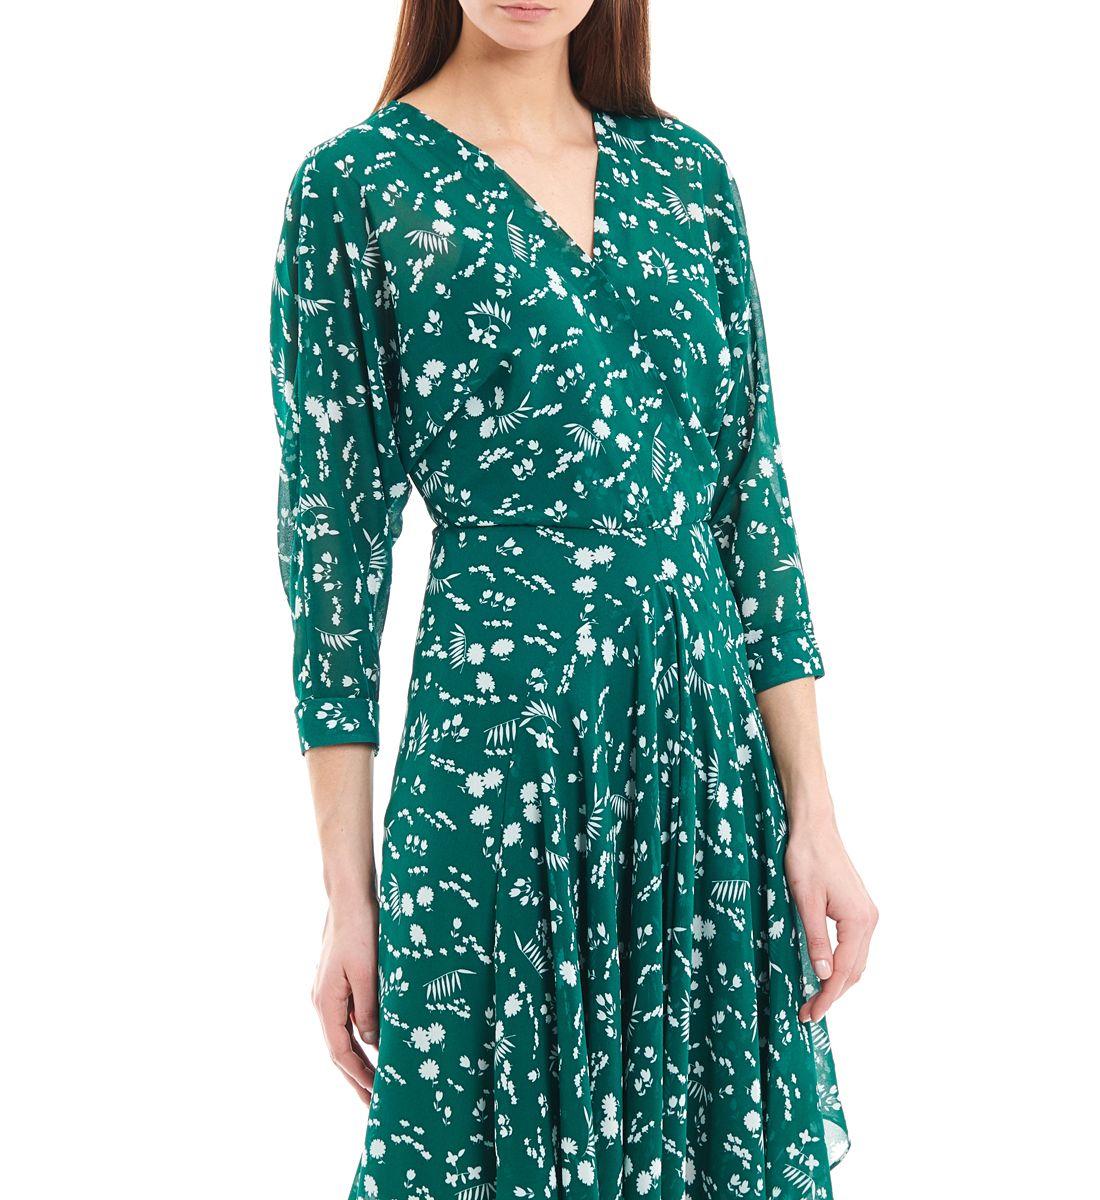 Galeries Femme Vert Pour Robe Rubis En Maje LafayetteOutfits lFKJT1c